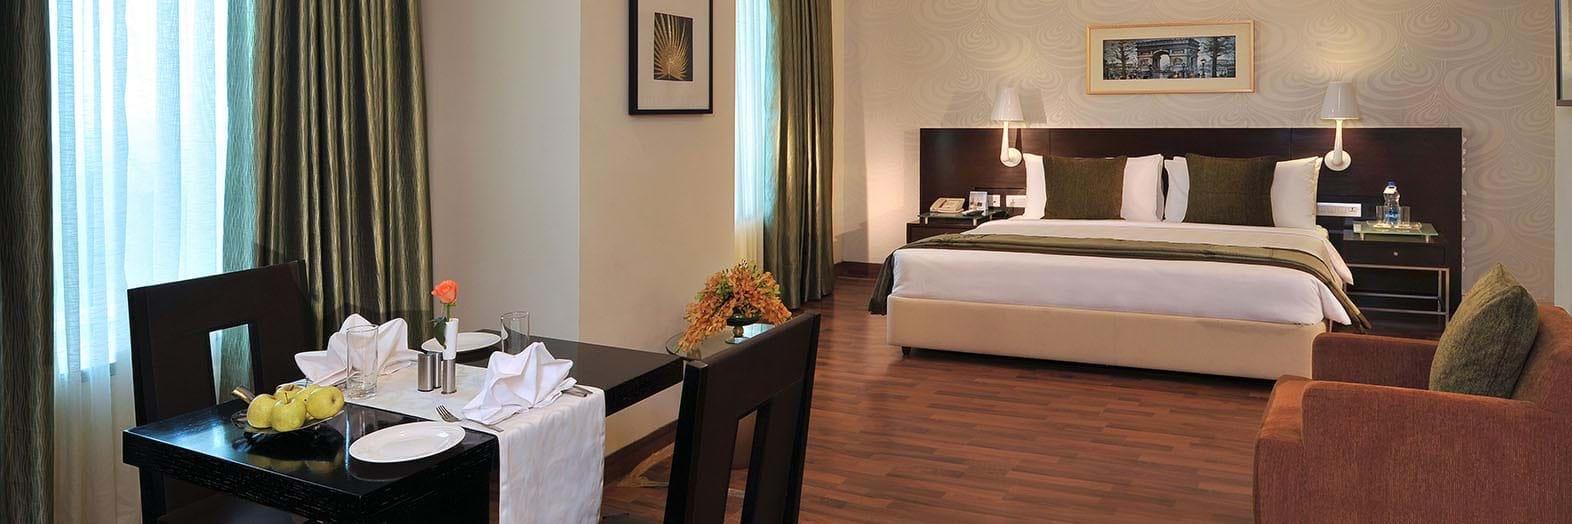 Fortune Select Excalibur, Gurgaon Hotels